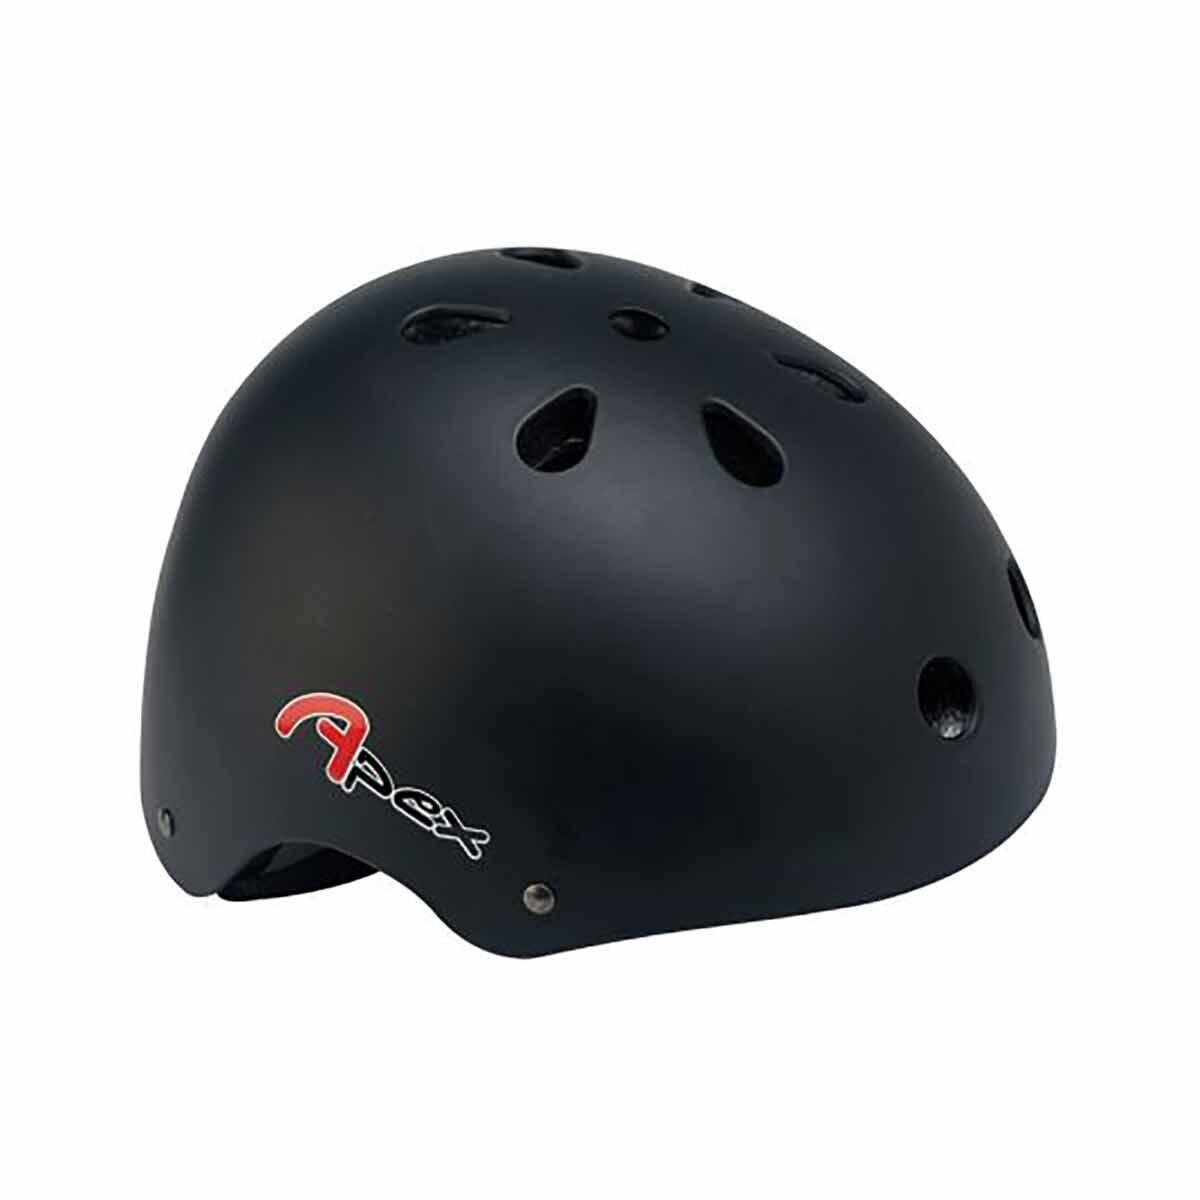 ETC BMX Skate Helmet 59-61 cm